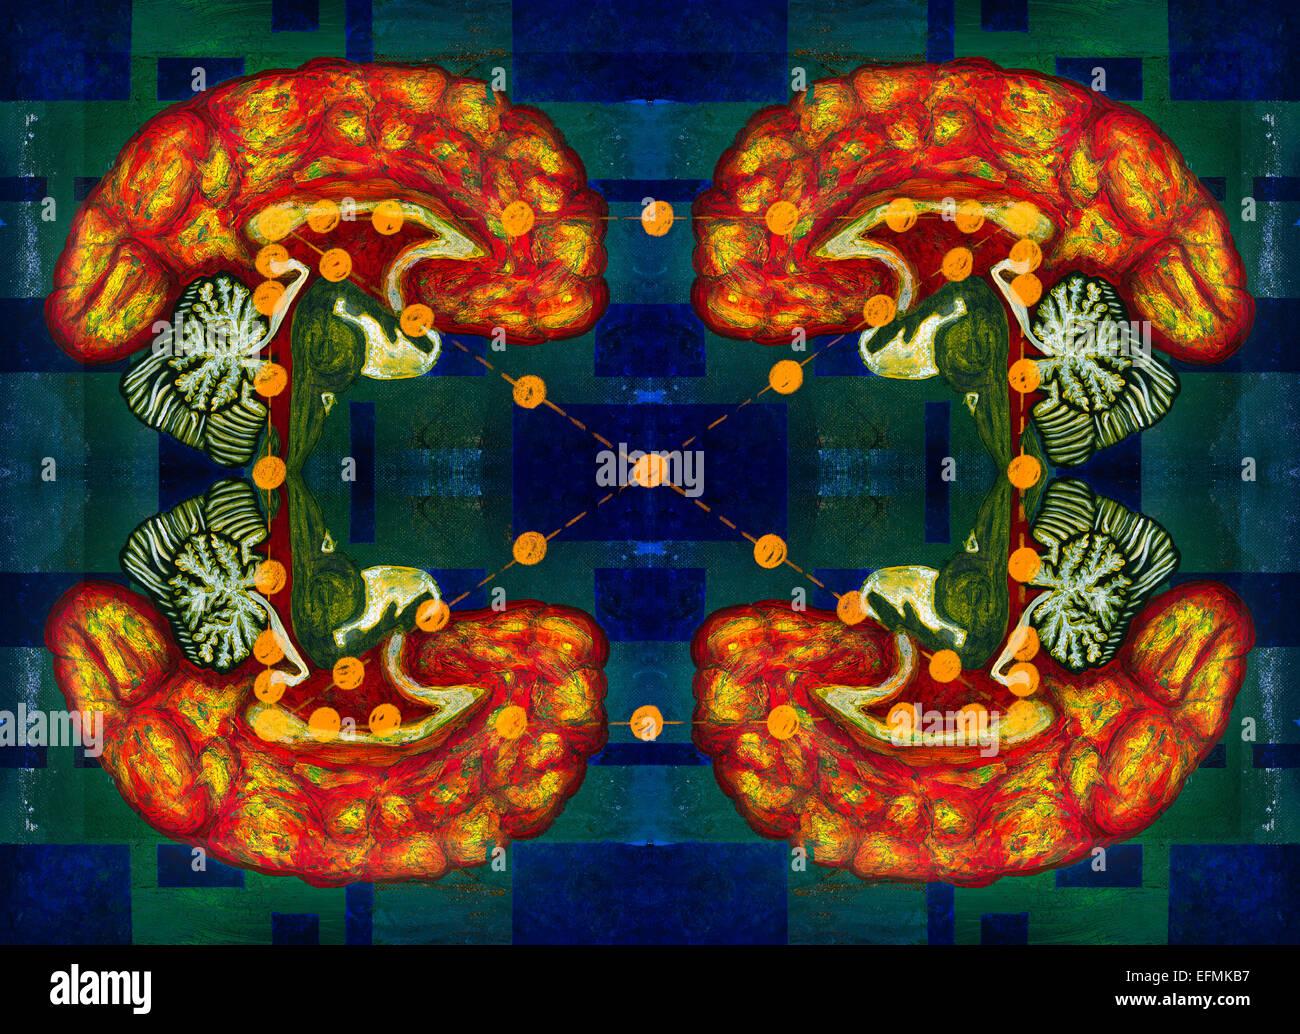 Illustration of multiple brains communicating - Stock Image